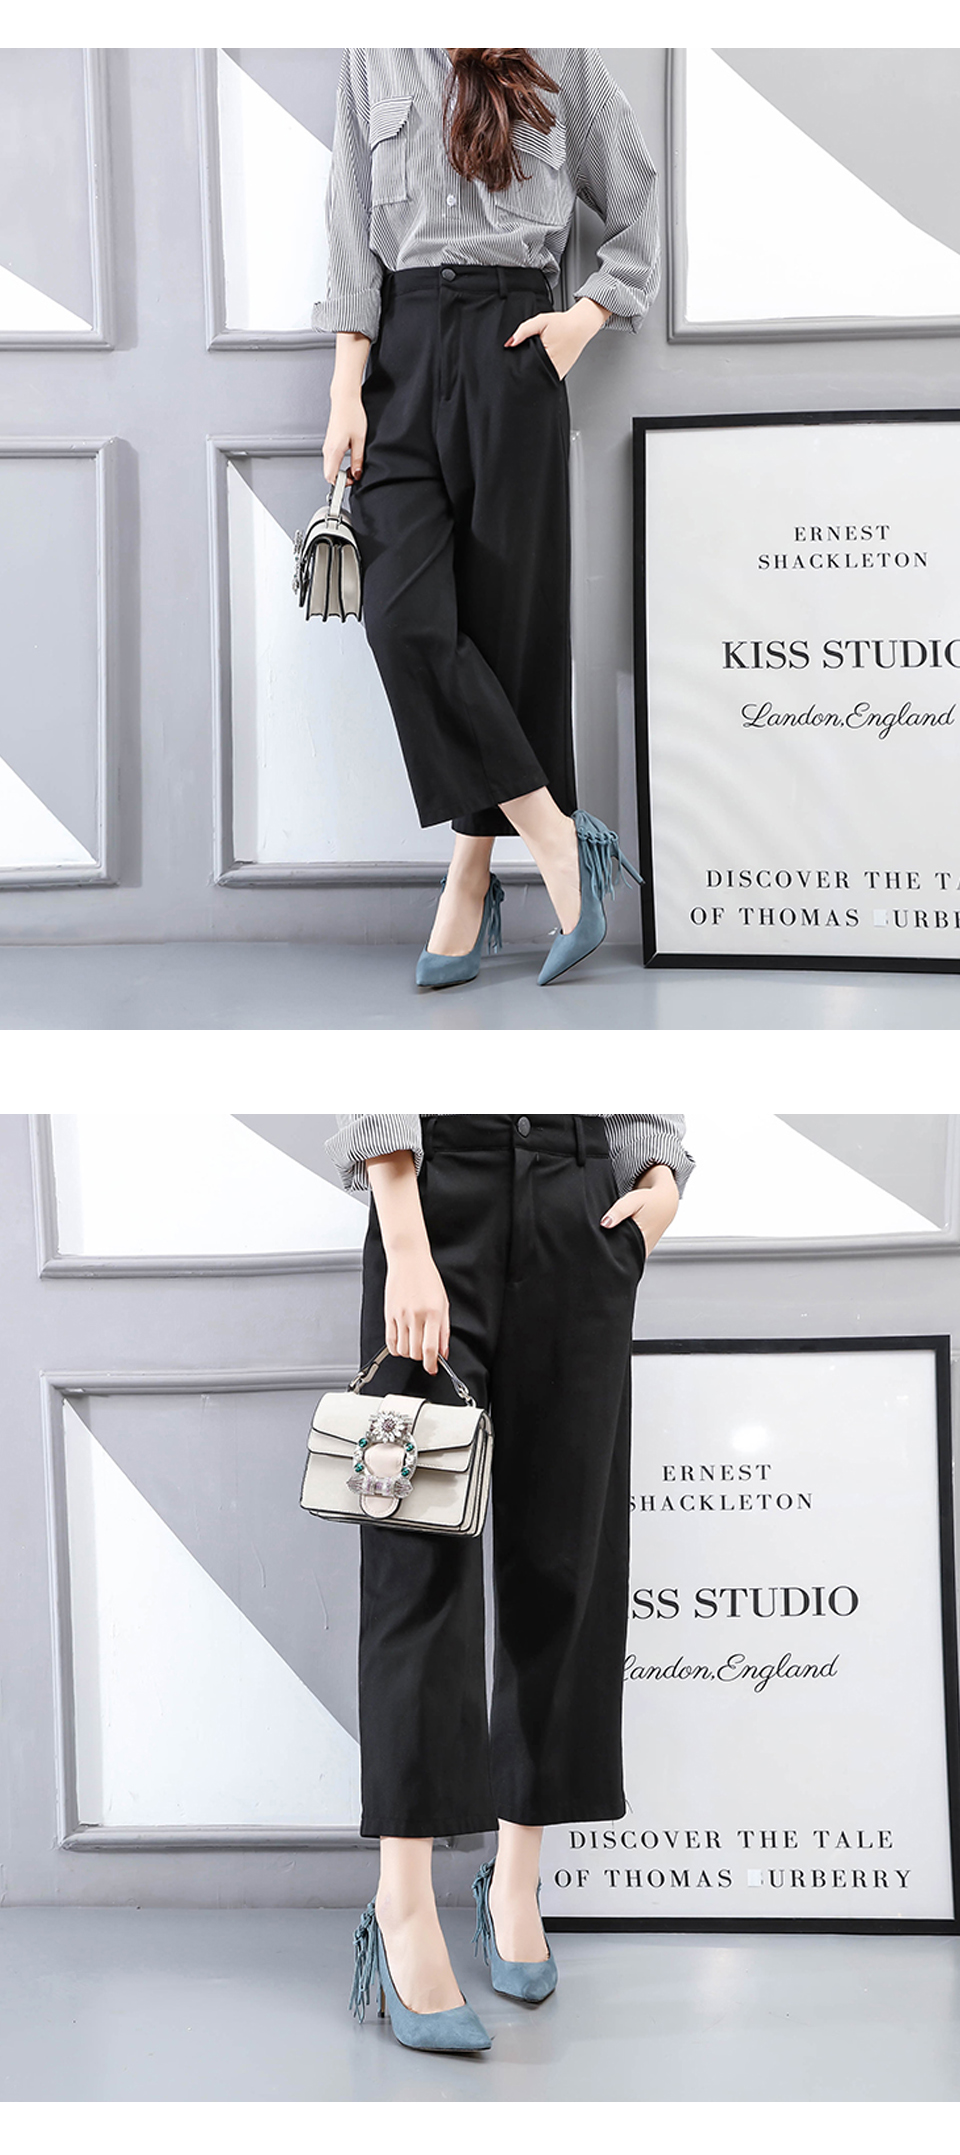 Woman Shoes High Heels Brand Women Pumps Tassel Fashion Office Lady Dress Shoes Black Spring Autumn Pointed Toe Female Pumps DE 6